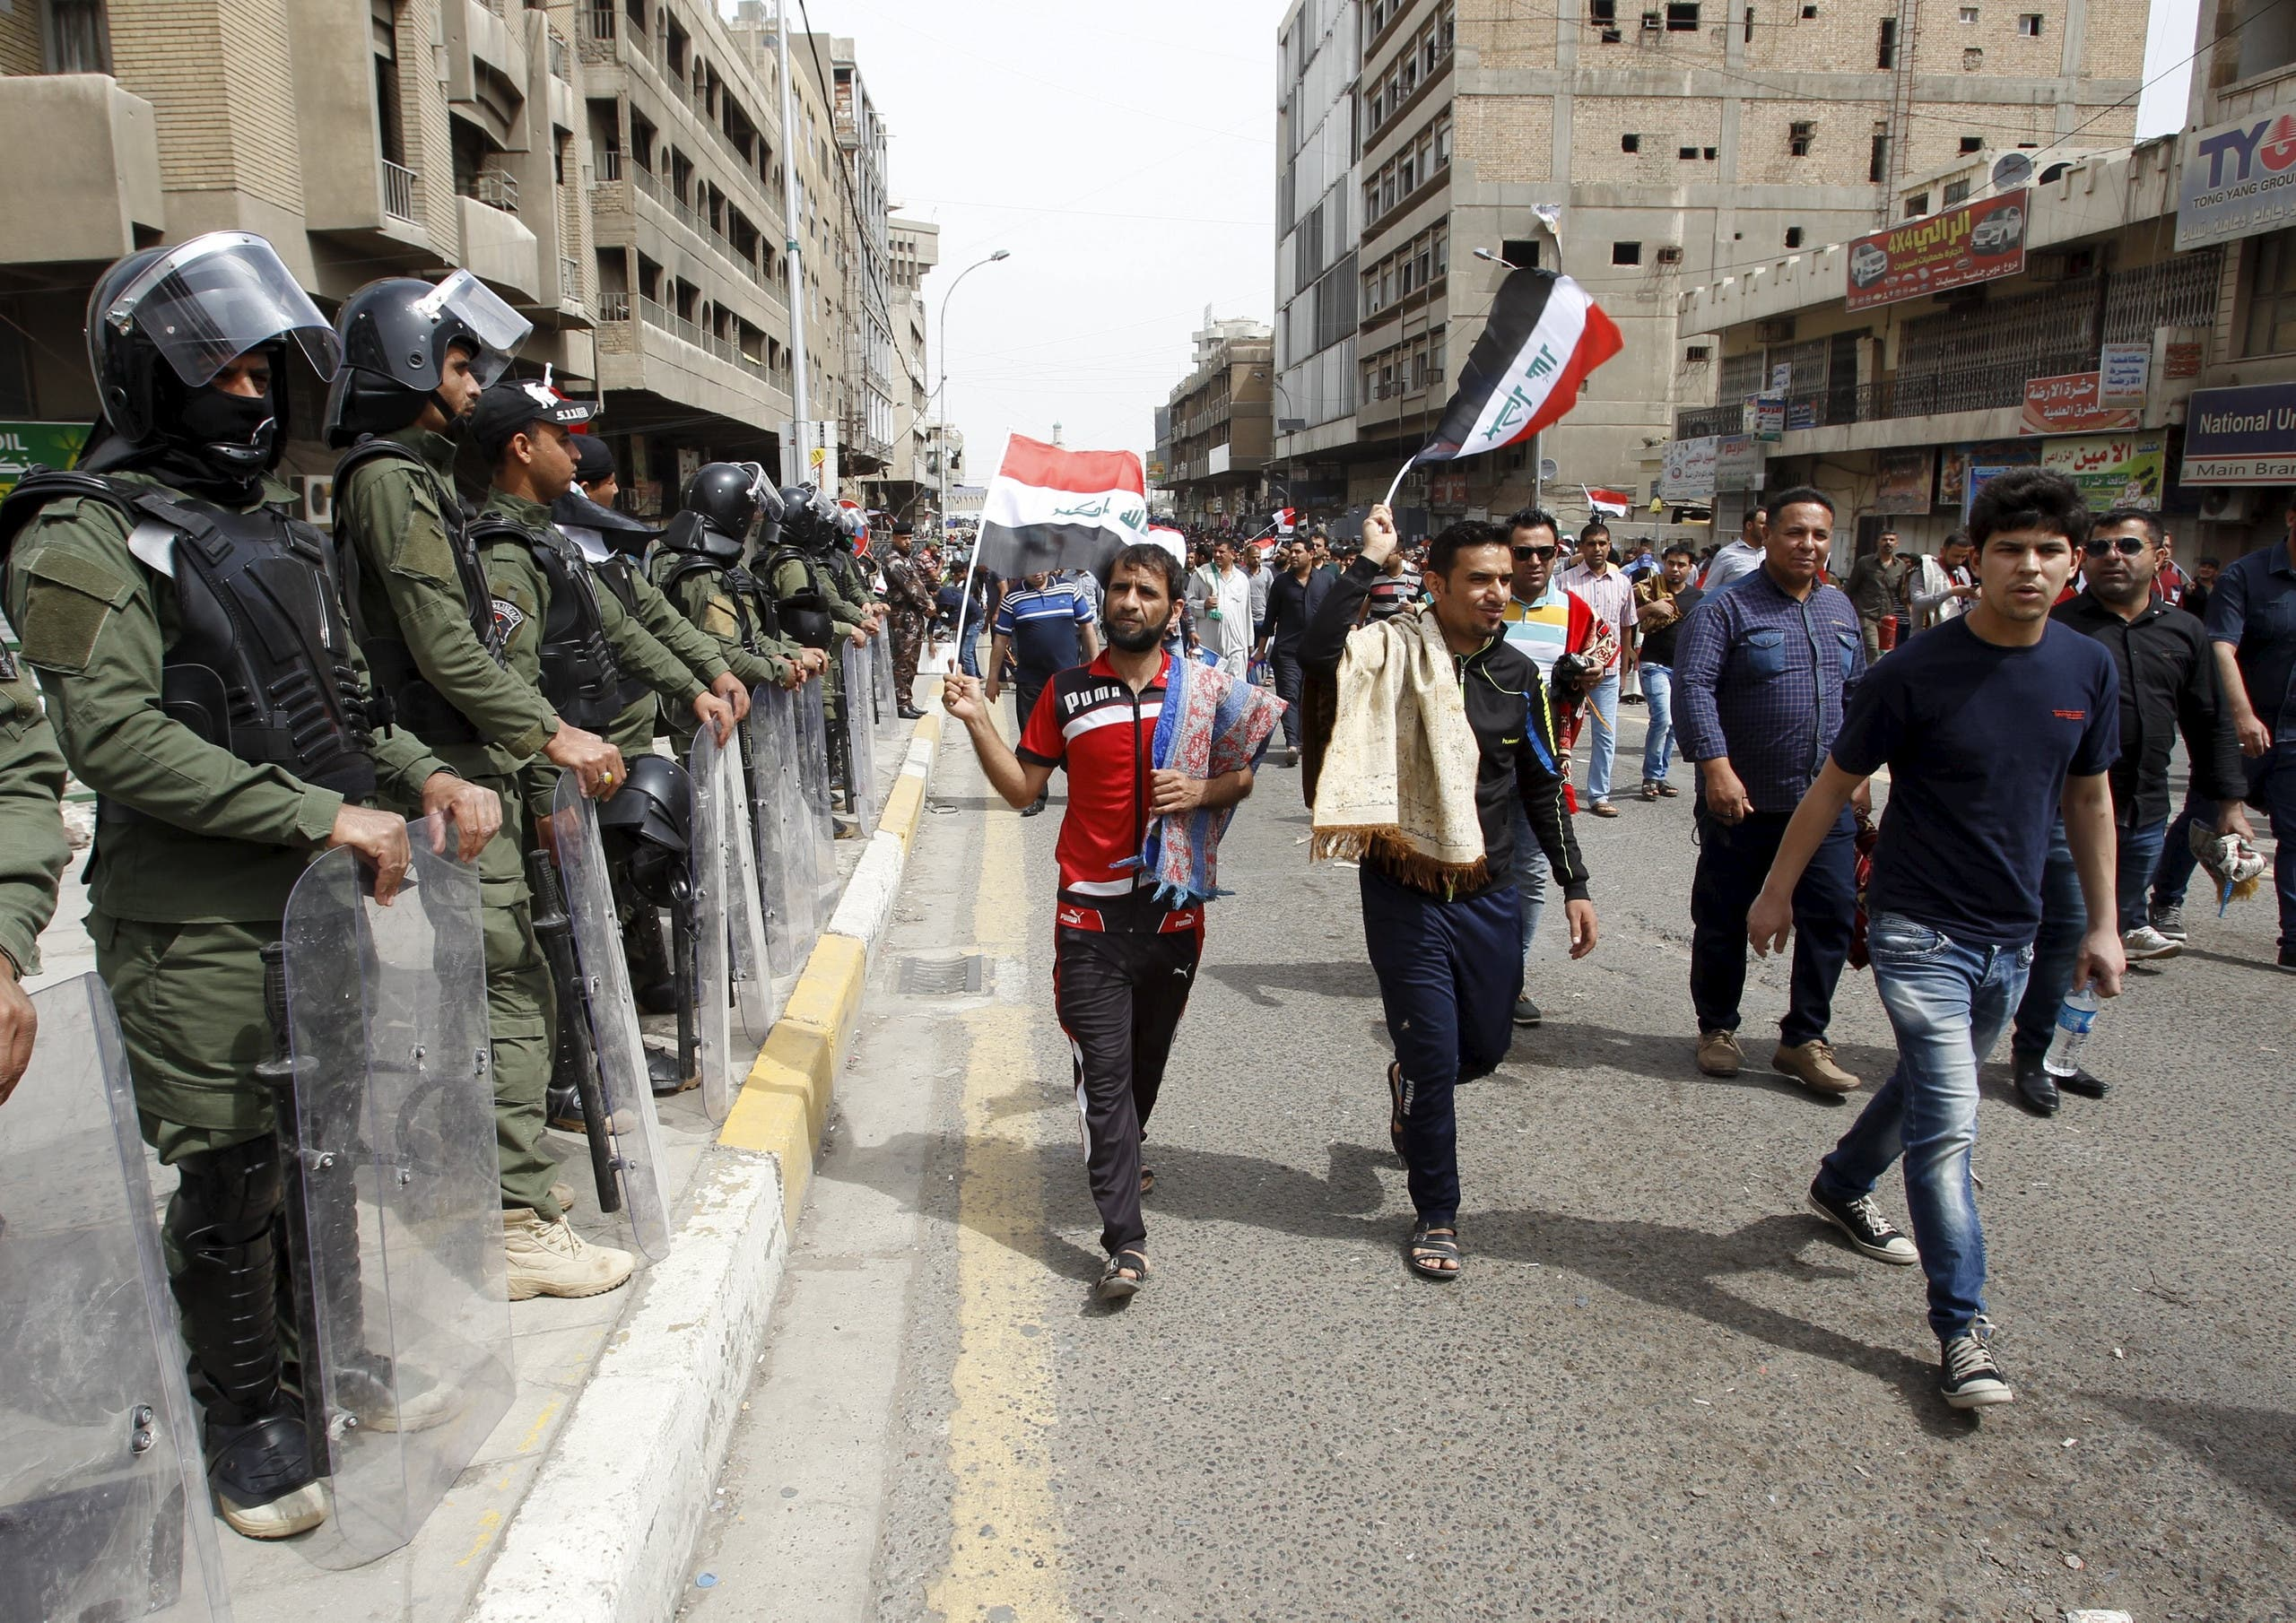 Début de révolte en Irak? - Page 8 F358a5ed-53a7-4b40-8691-fdc1b1e81302